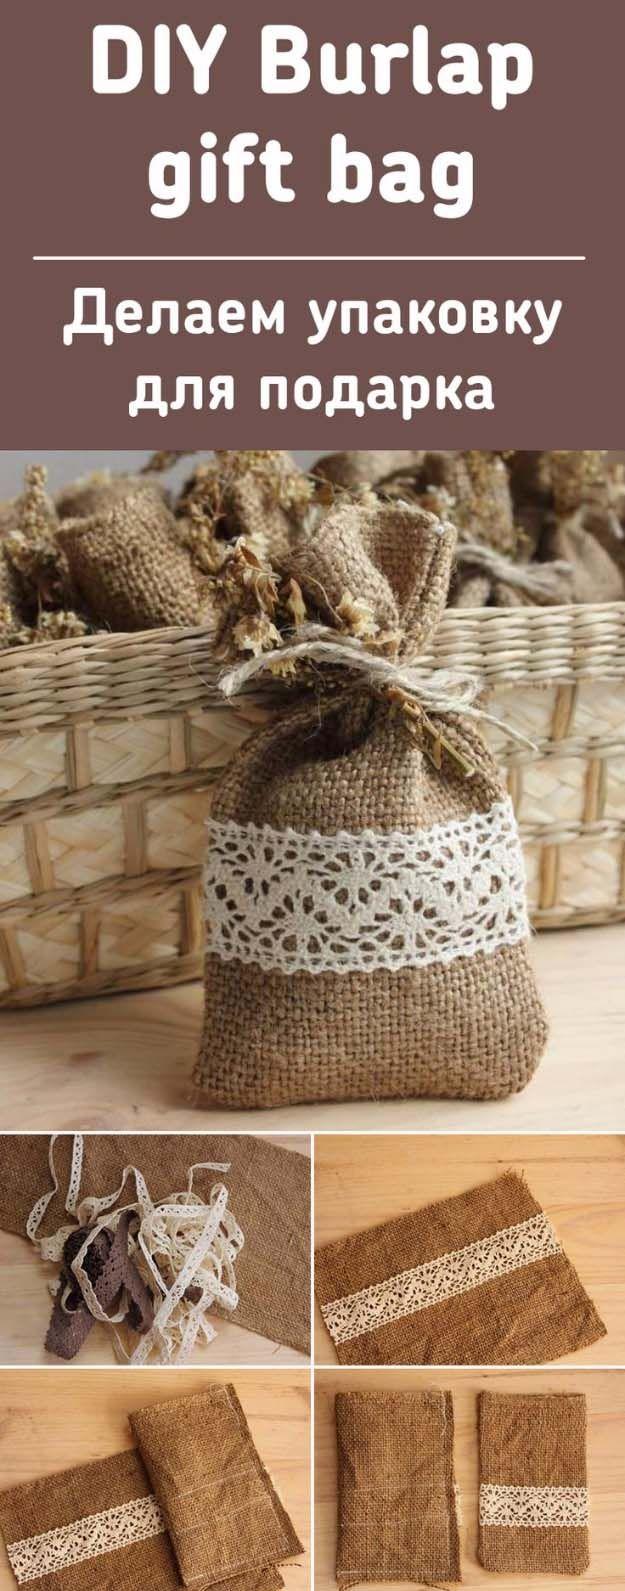 Best 25 burlap gift bags ideas on pinterest bolsas de for Burlap bag craft ideas